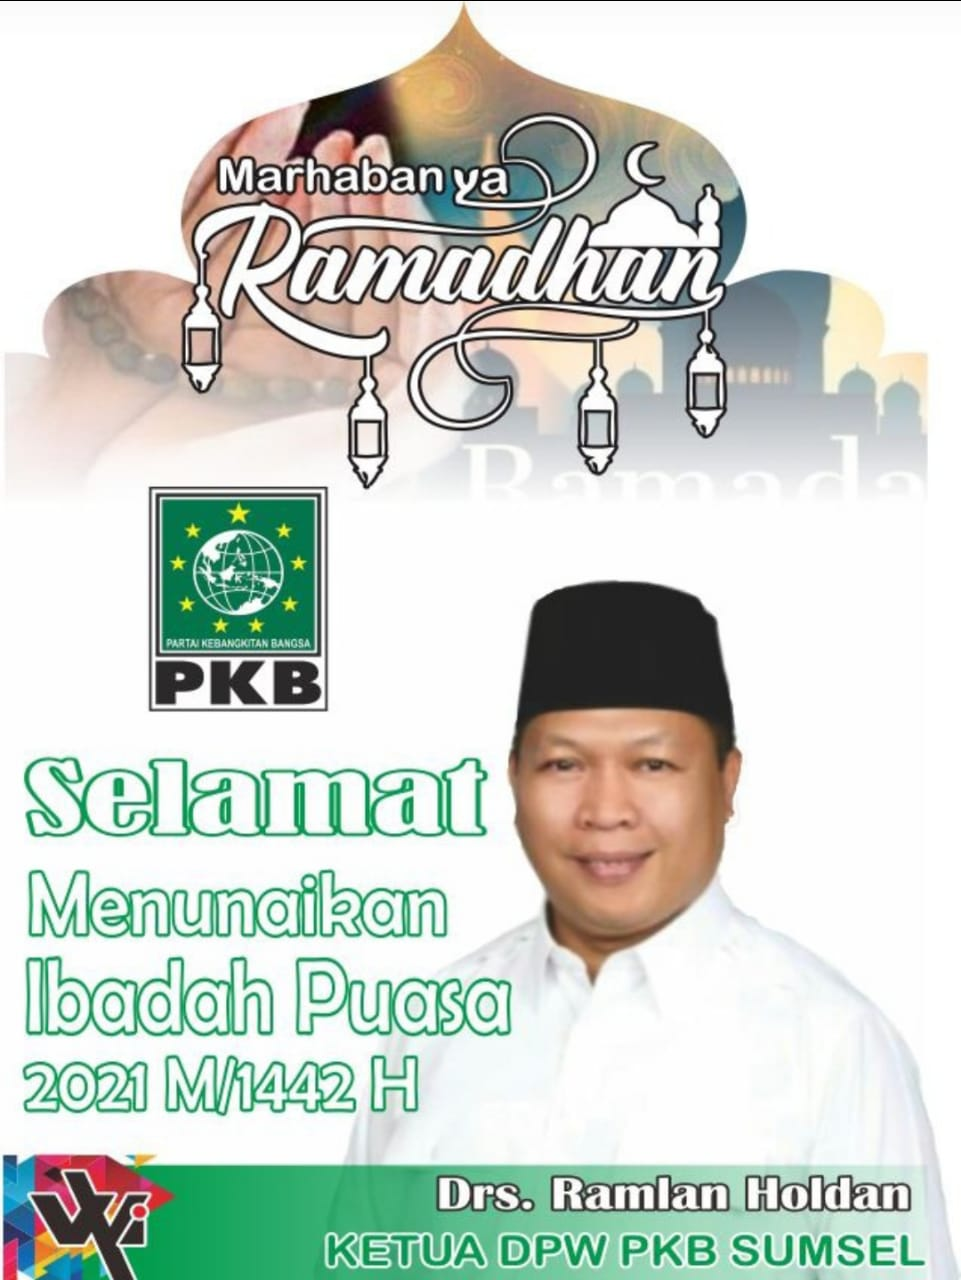 Ketua PKB Sumsel